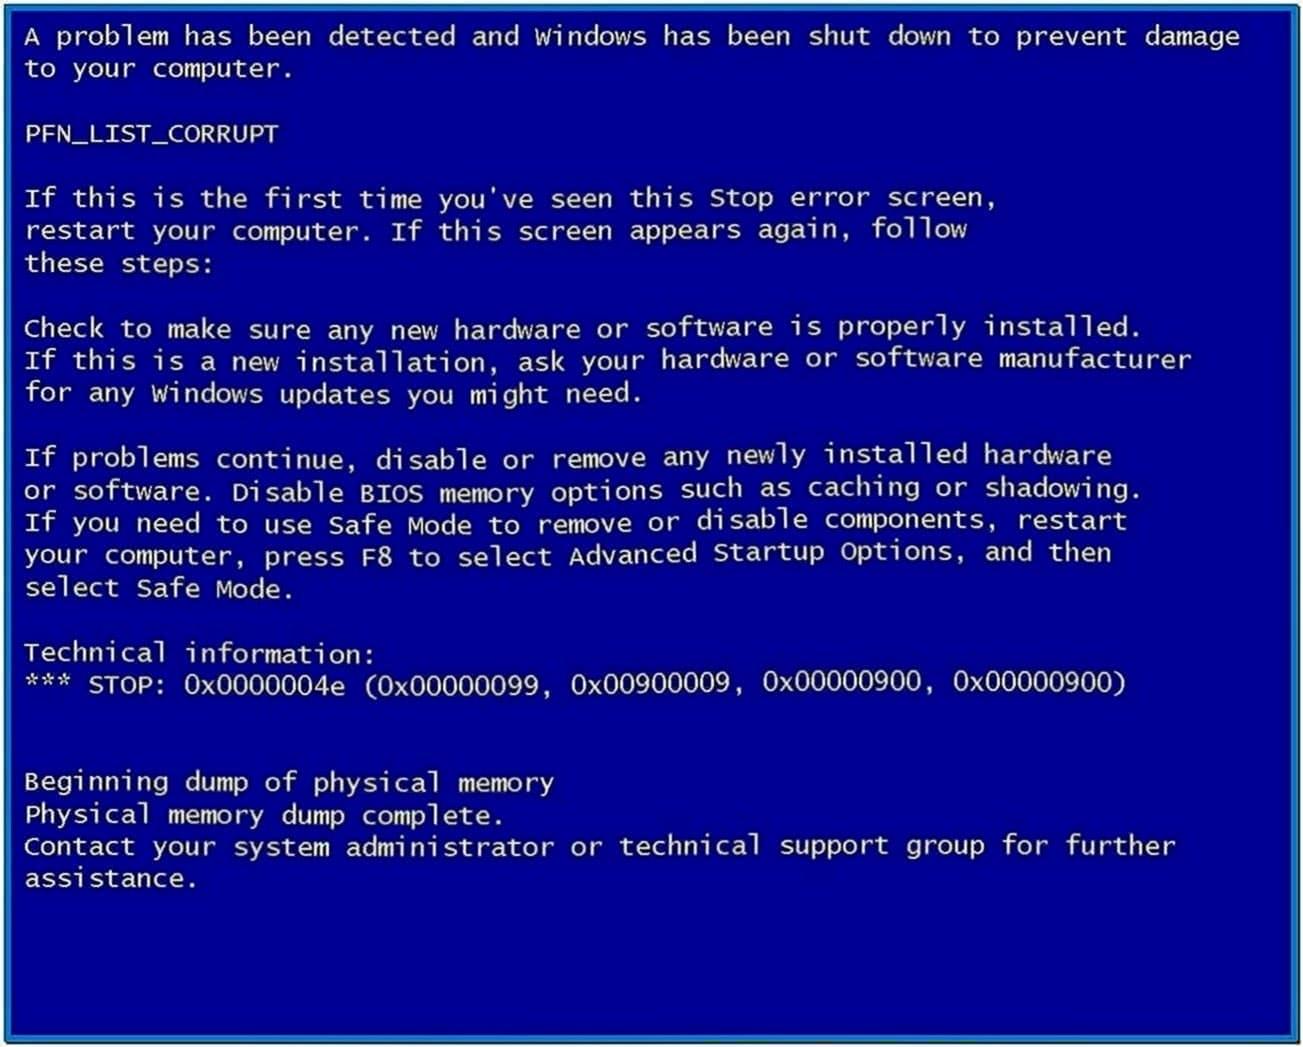 Windows Blue Screen Screensaver